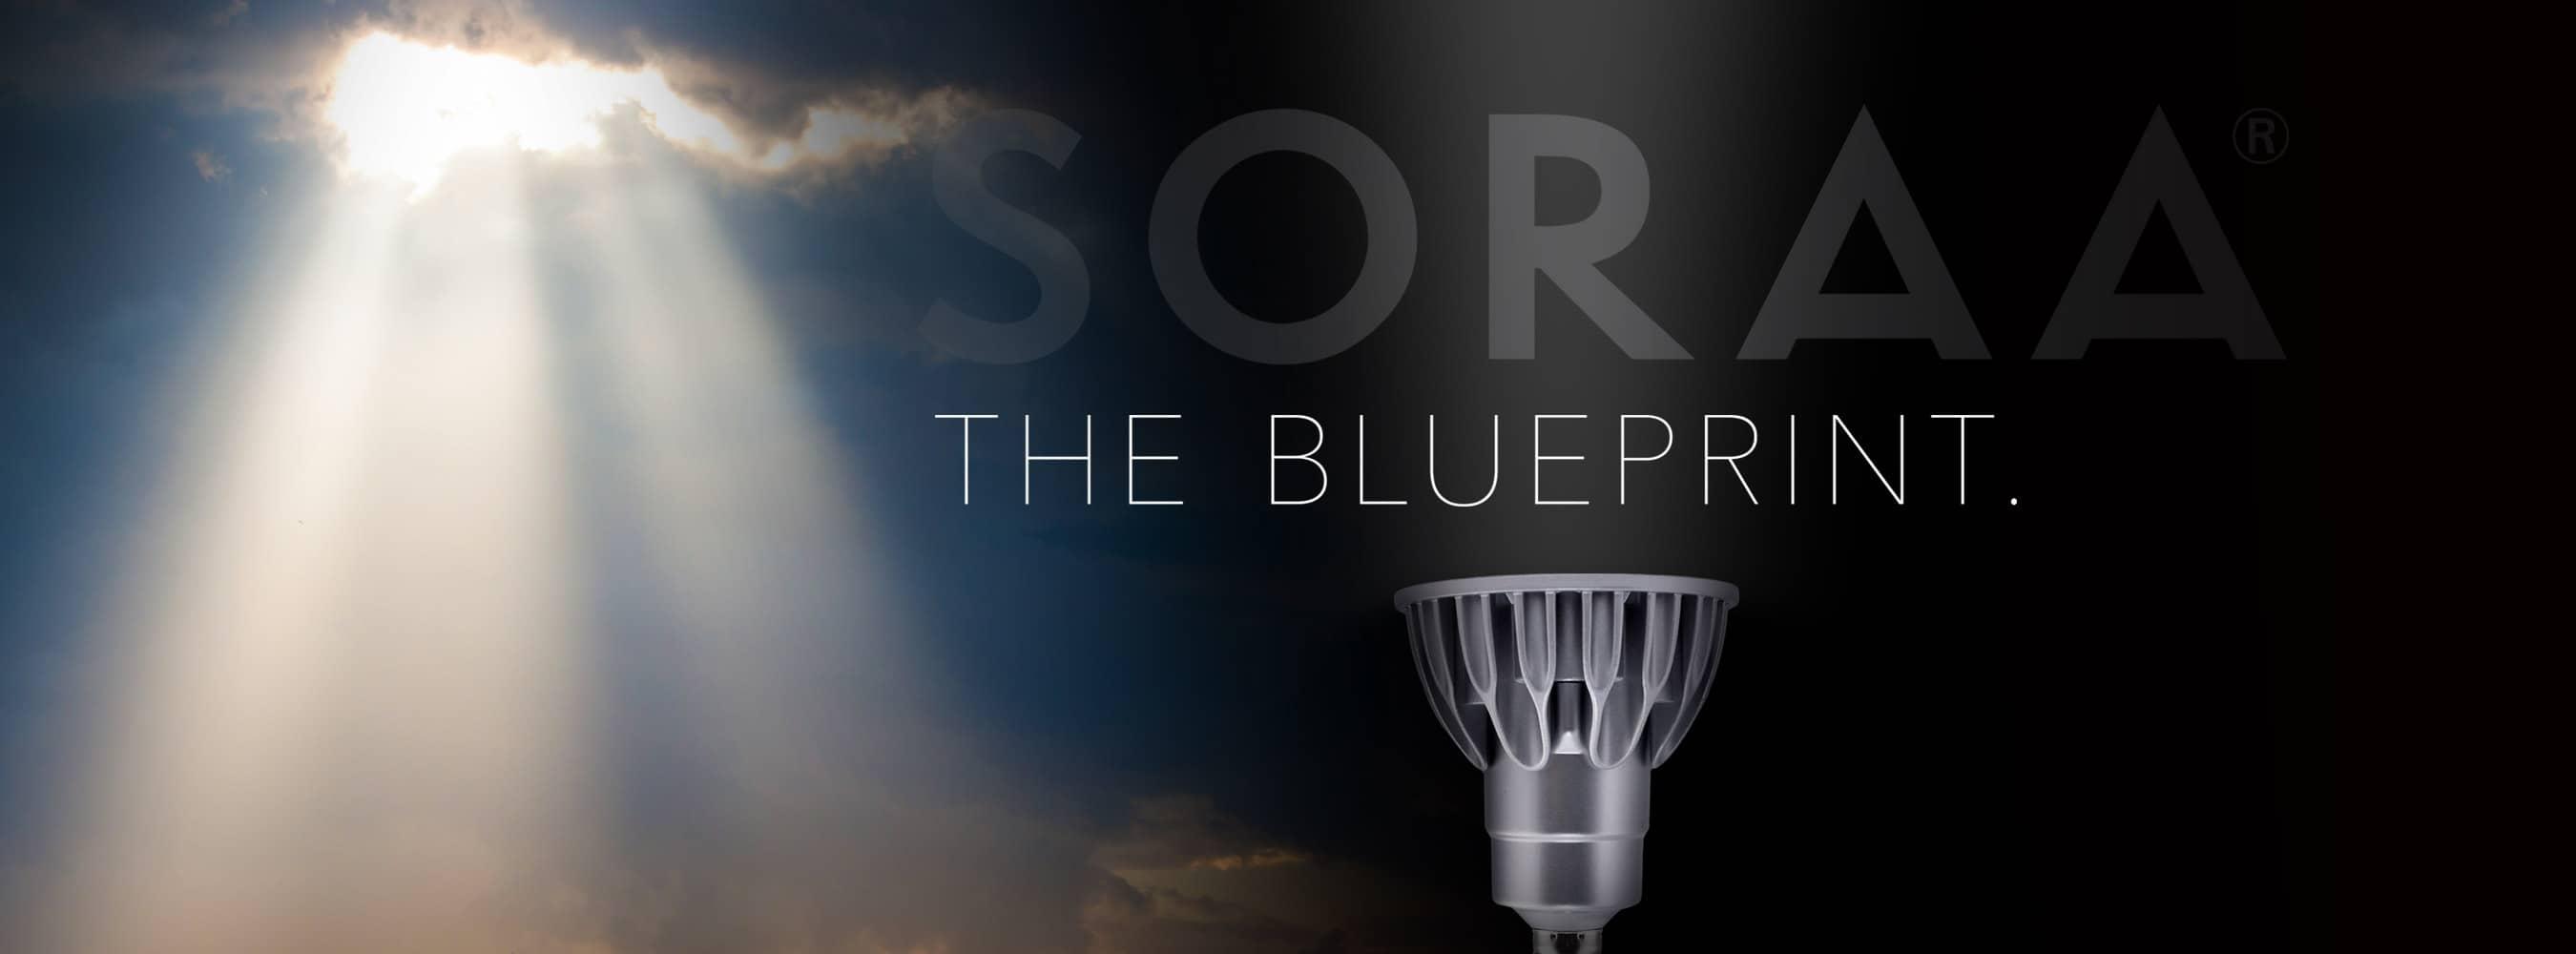 Soraa simply perfect light slide malvernweather Choice Image